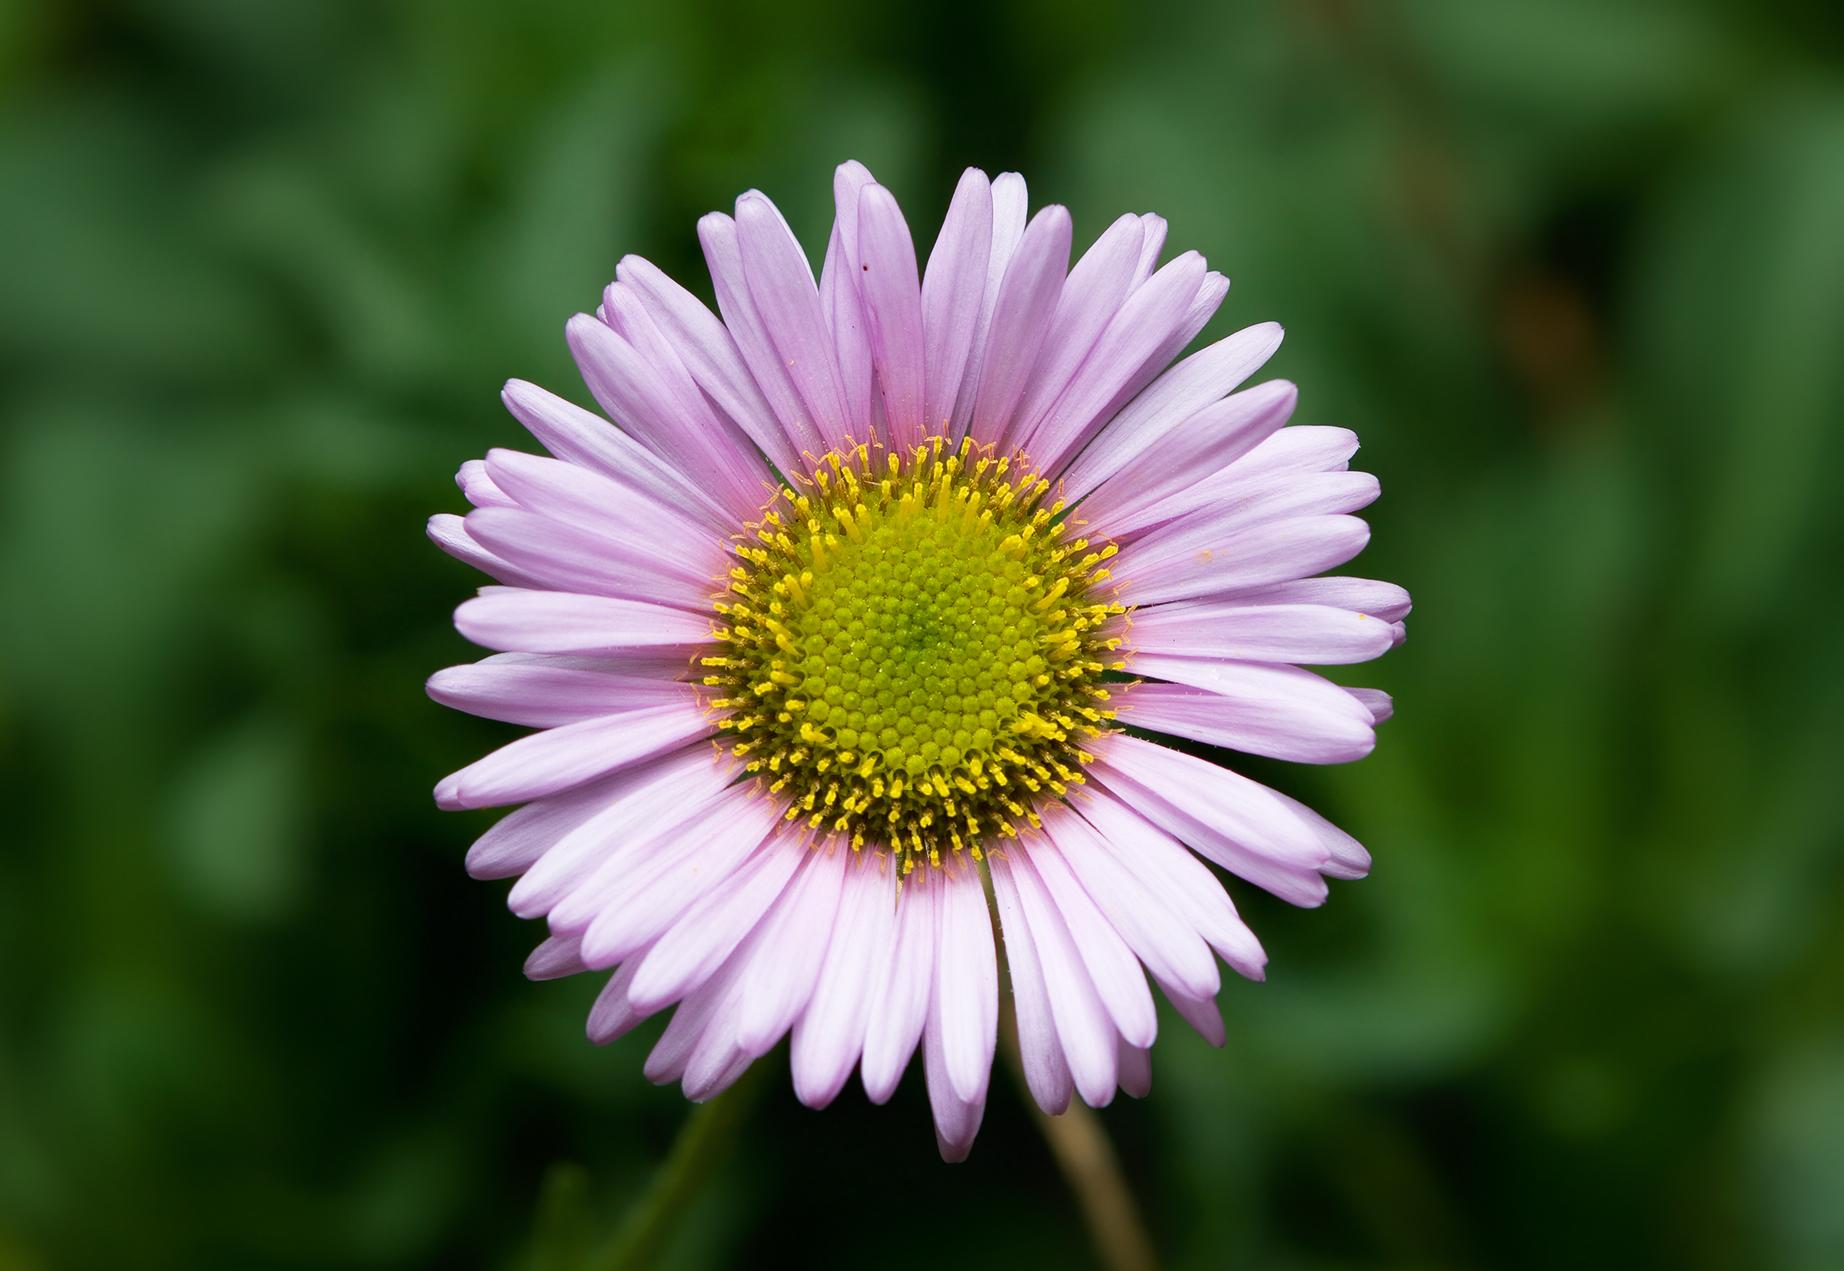 fleabane | Auntie Dogma's Garden Spot Pictures Of Flowers And Plants